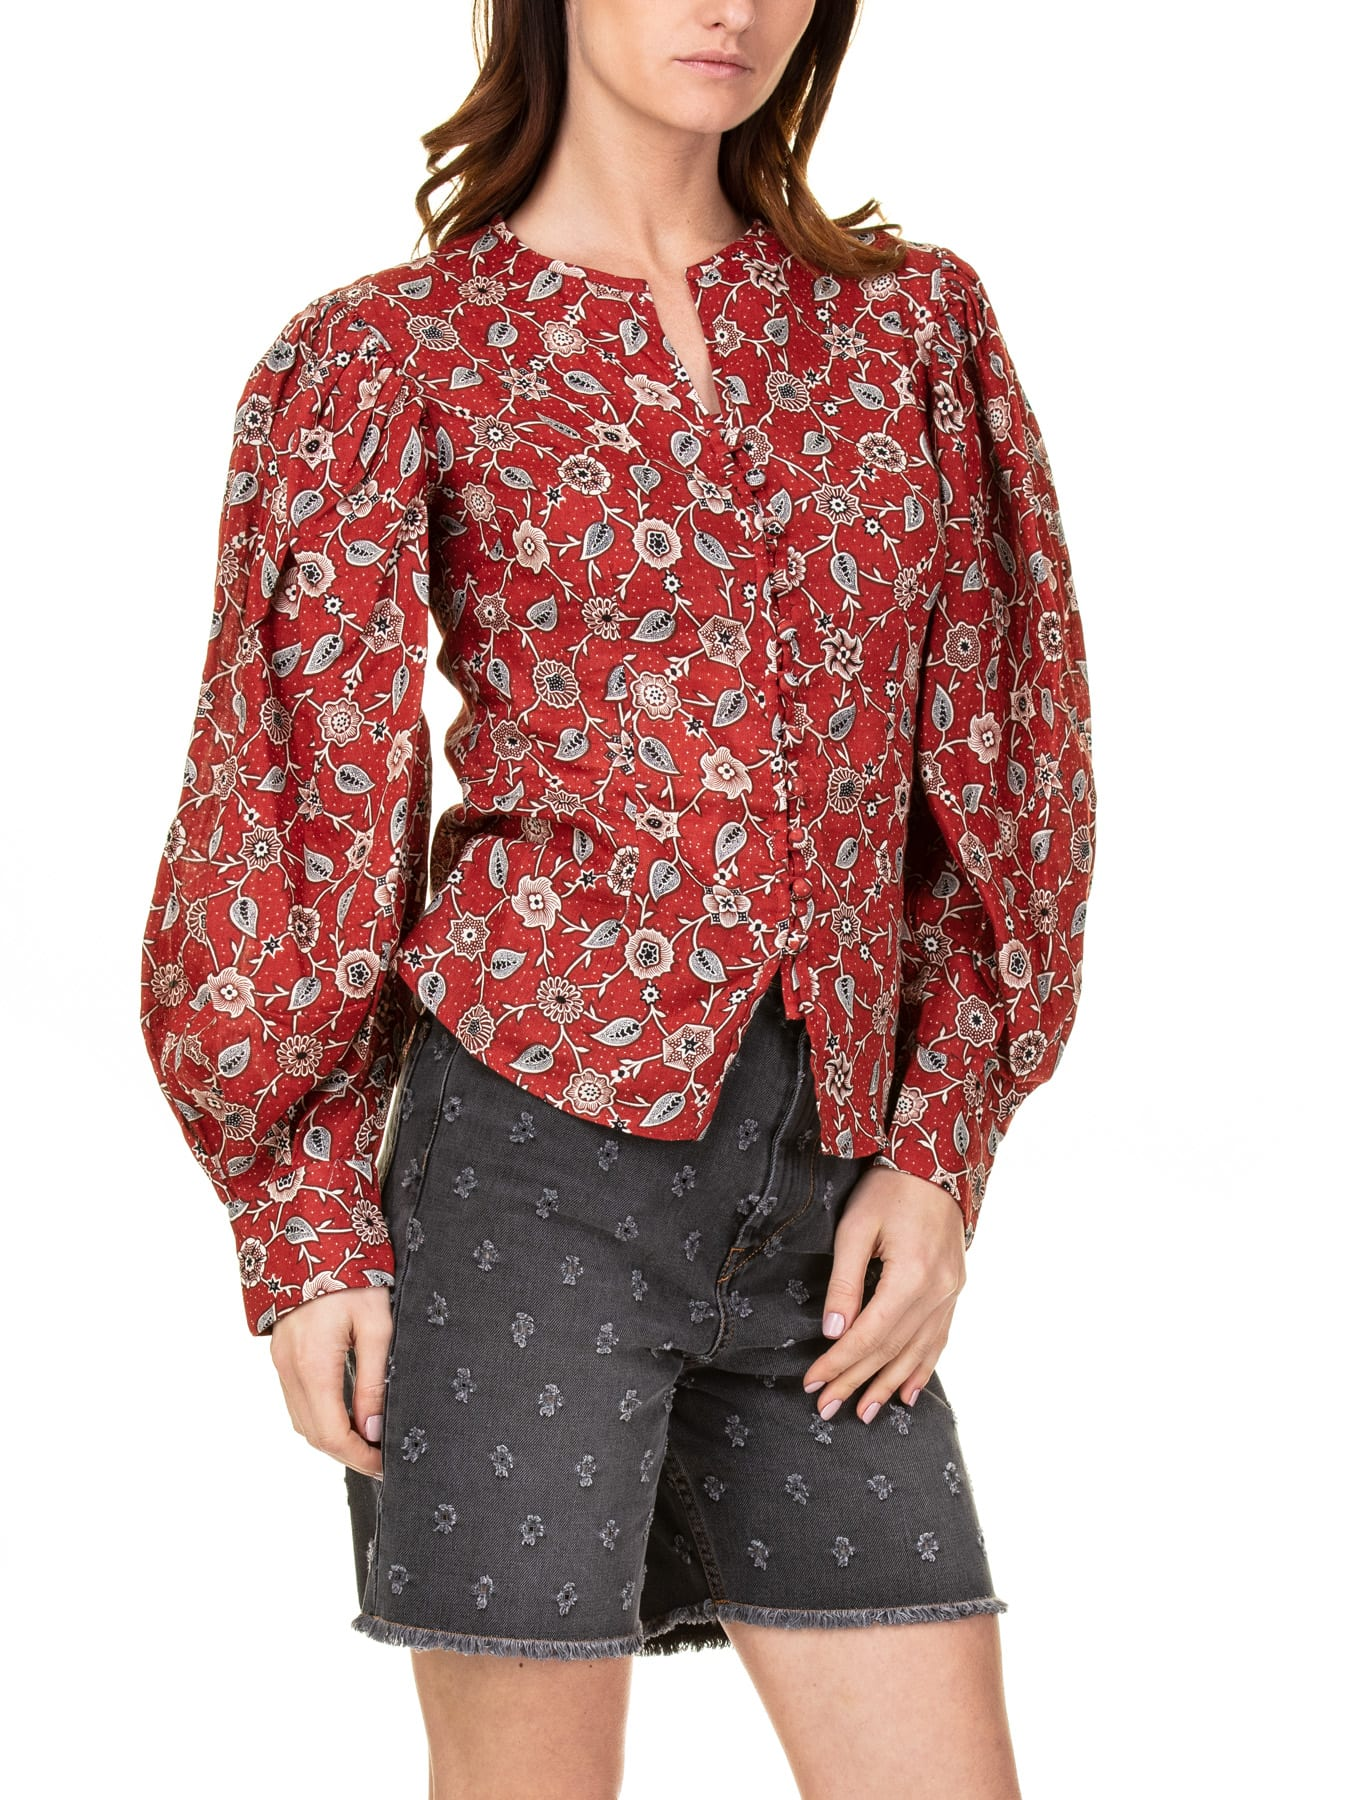 Isabel Marant Etoile Tilo Haut Shirt